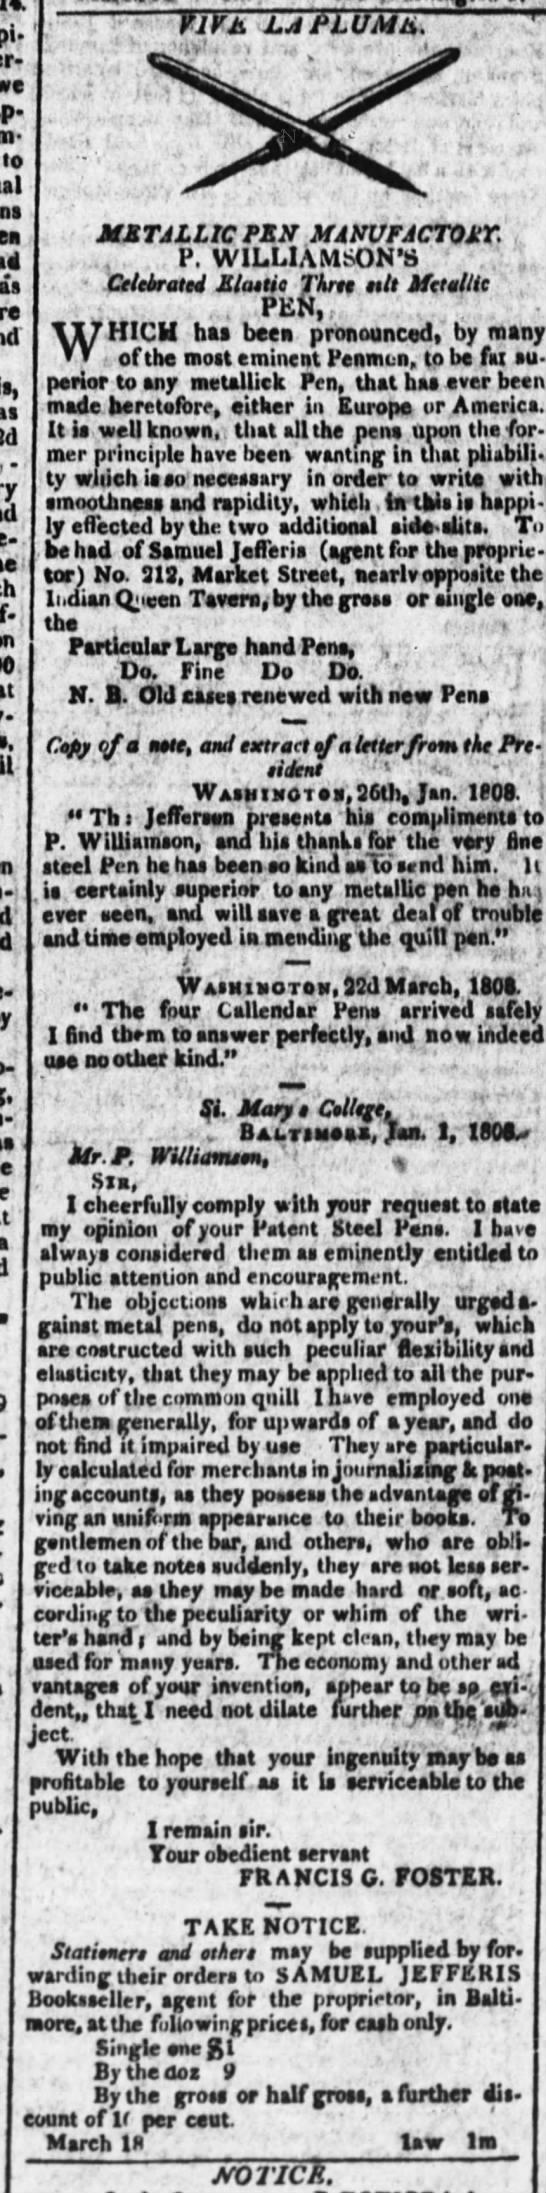 1809 Williamson ad with Jefferson